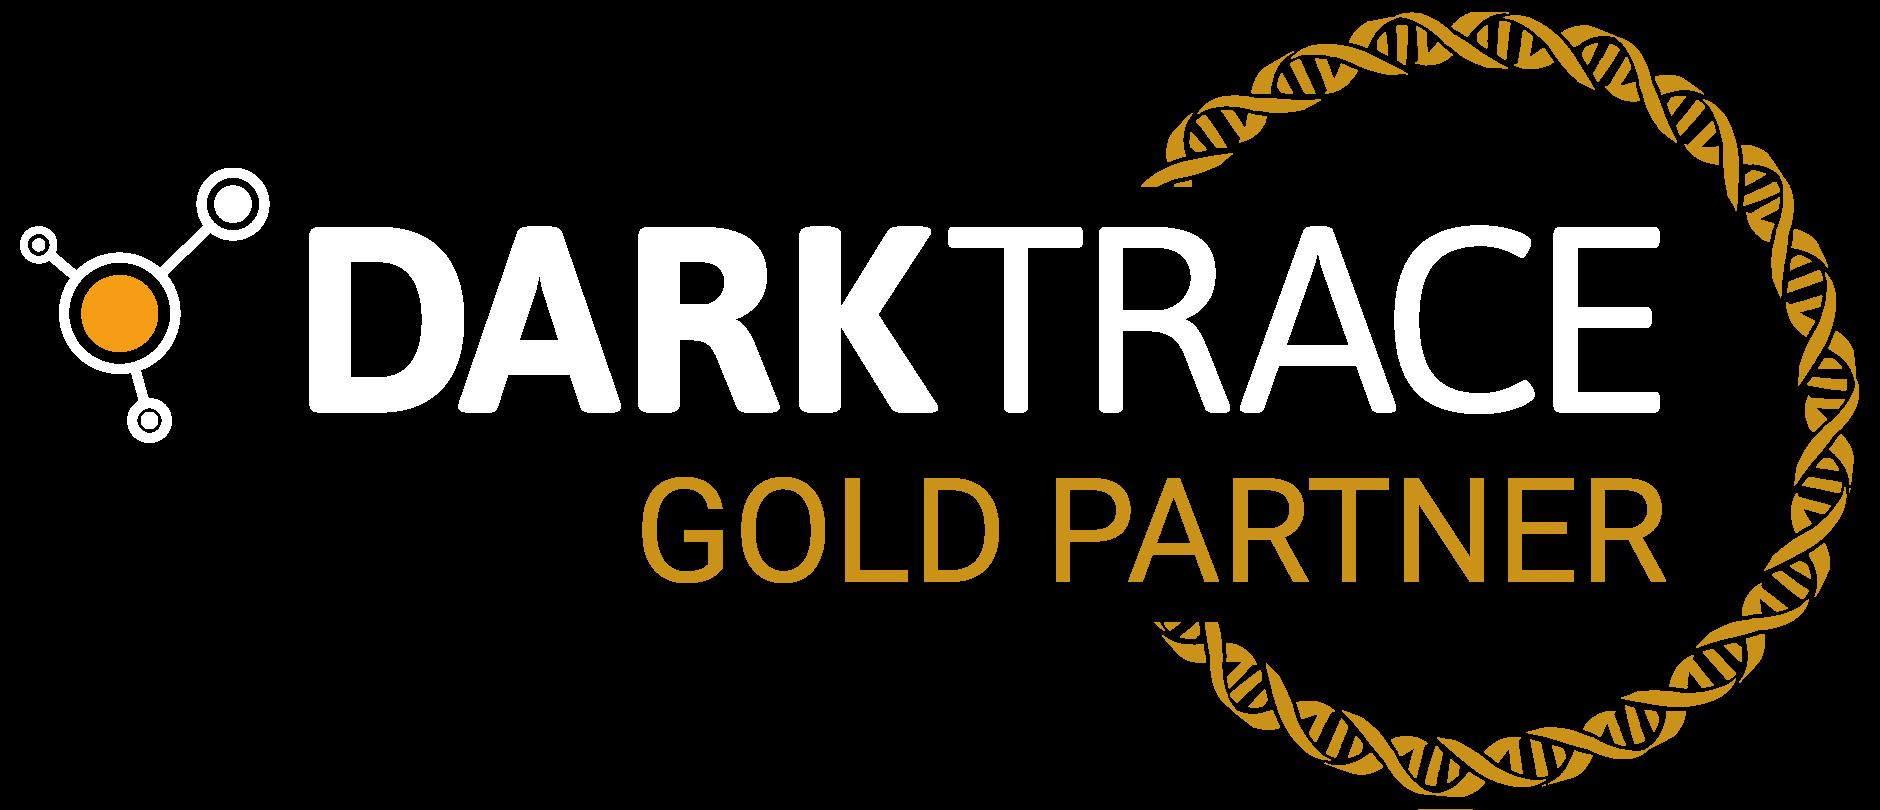 Darktrace 2